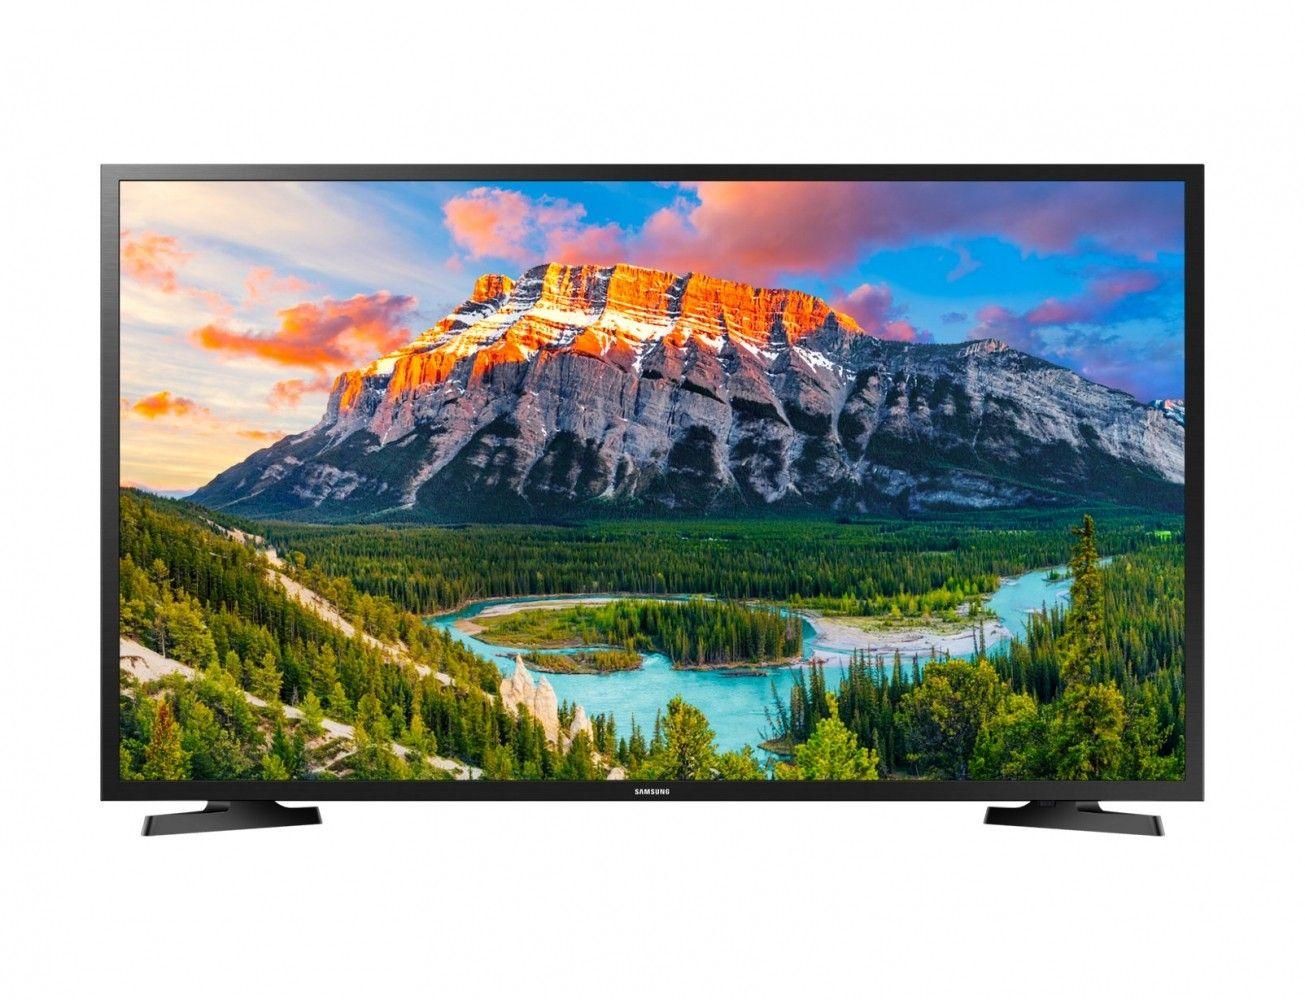 Купить Телевизоры, Телевизор Samsung UE32N5000AUXUA